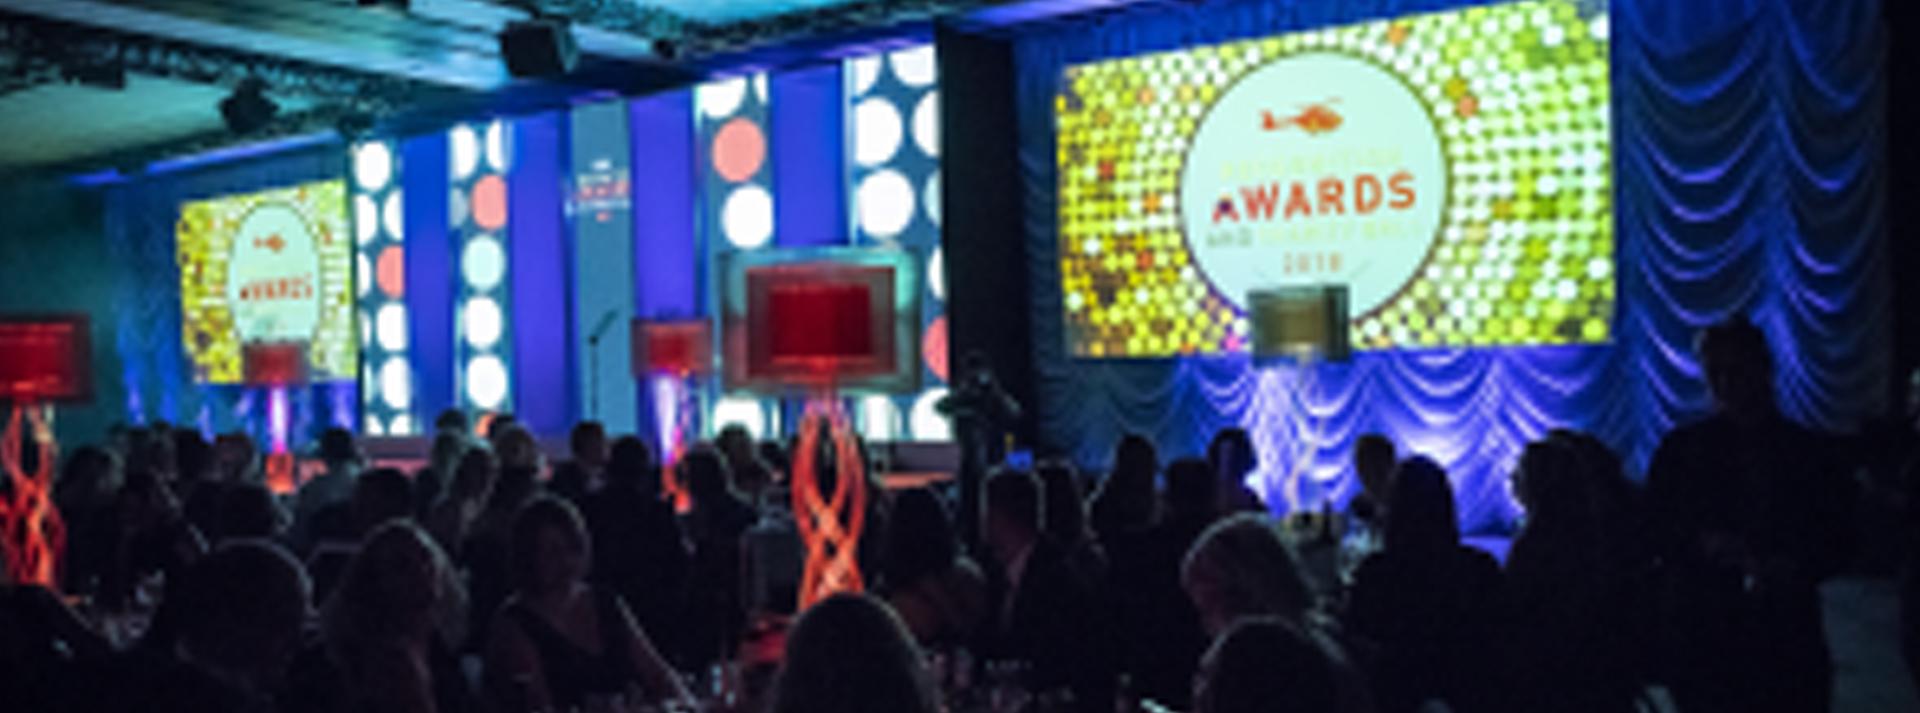 £142,000 Raised At Glittering Gala